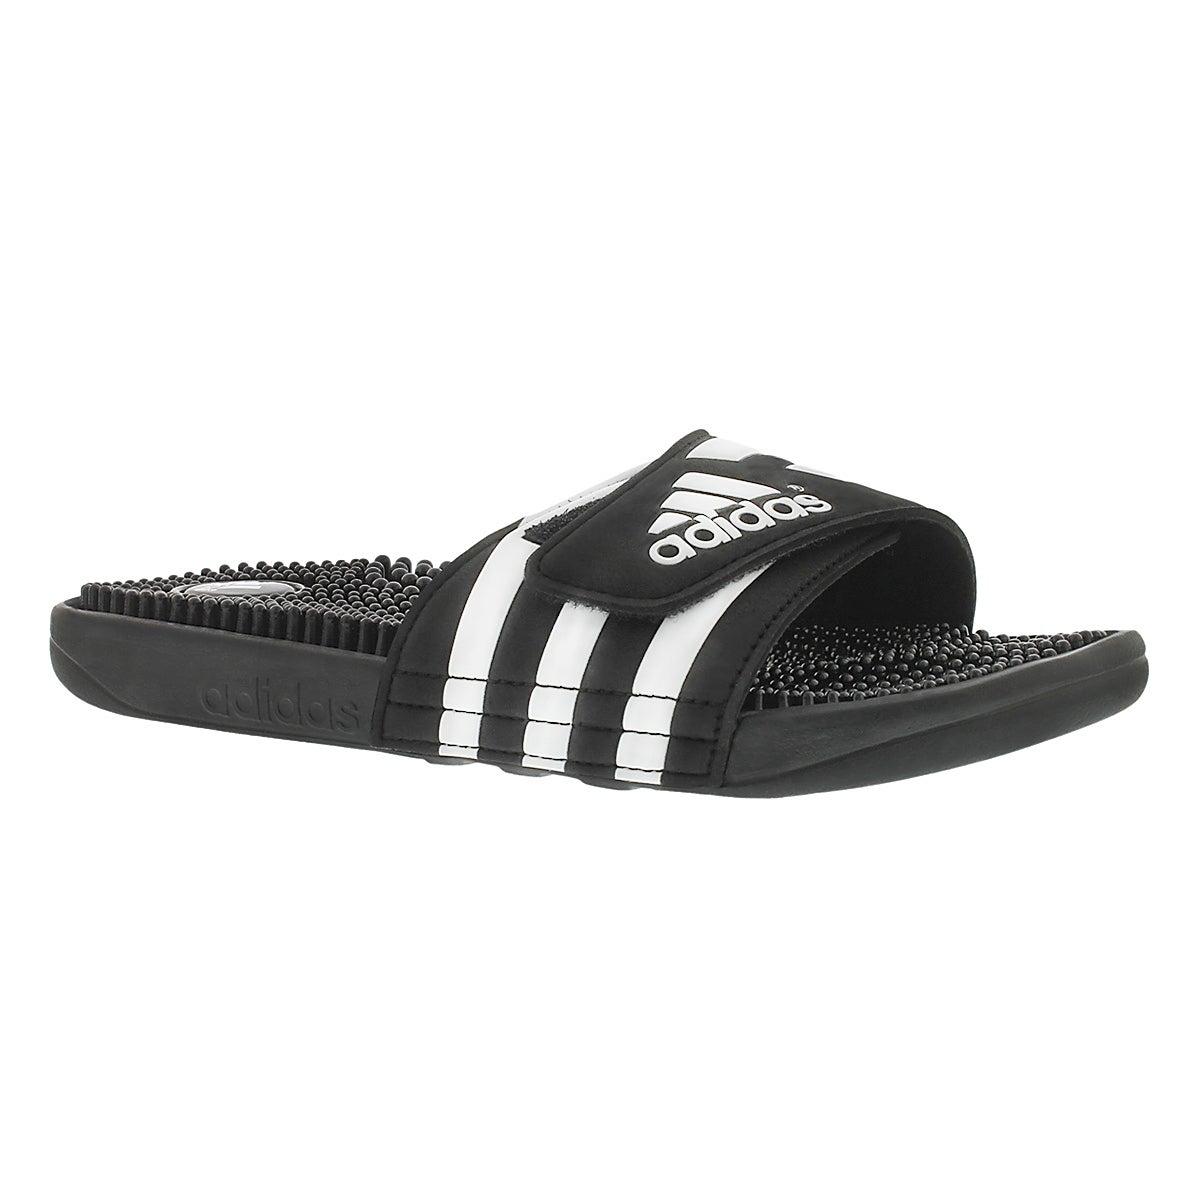 Sandales Adissage, noir/blanc, hom